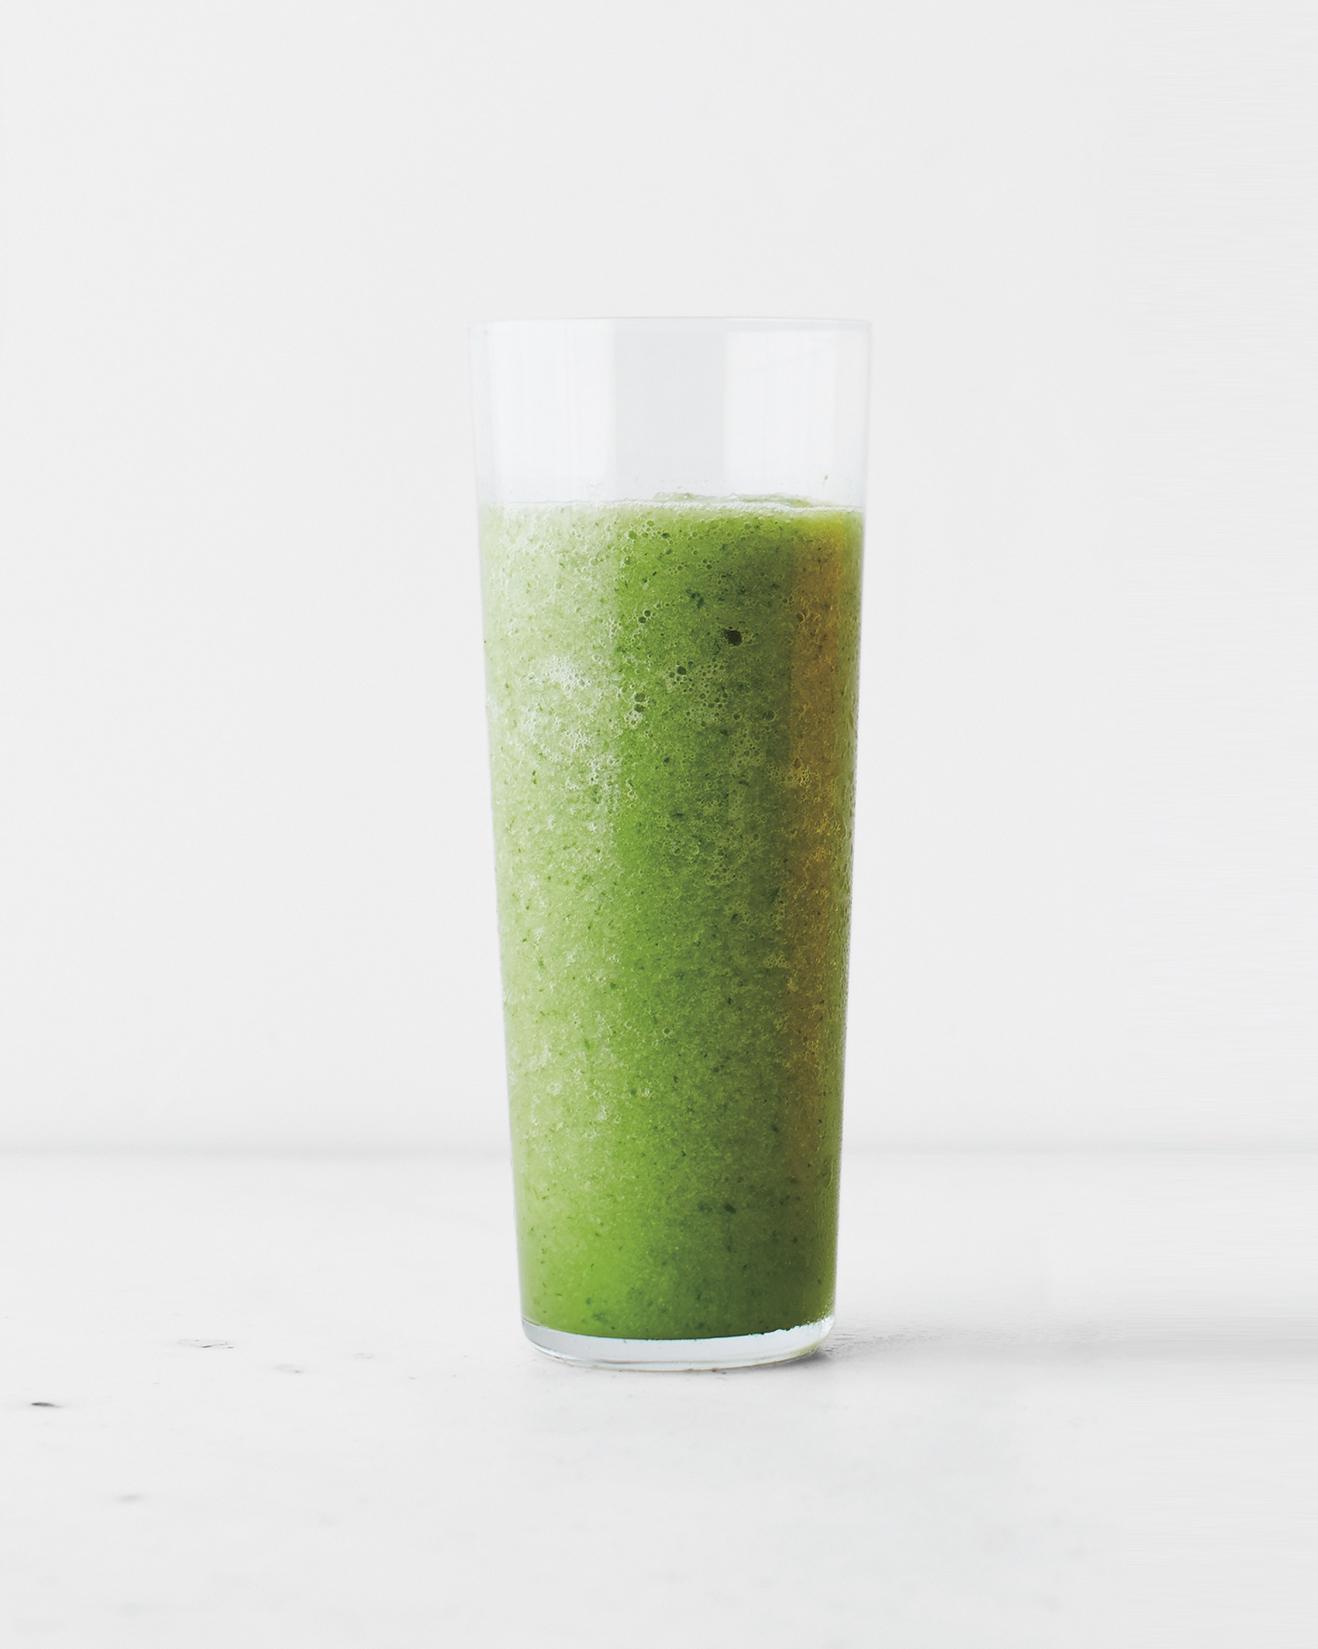 clean-slate-juice-melon-mint-smoothie-0115.jpg